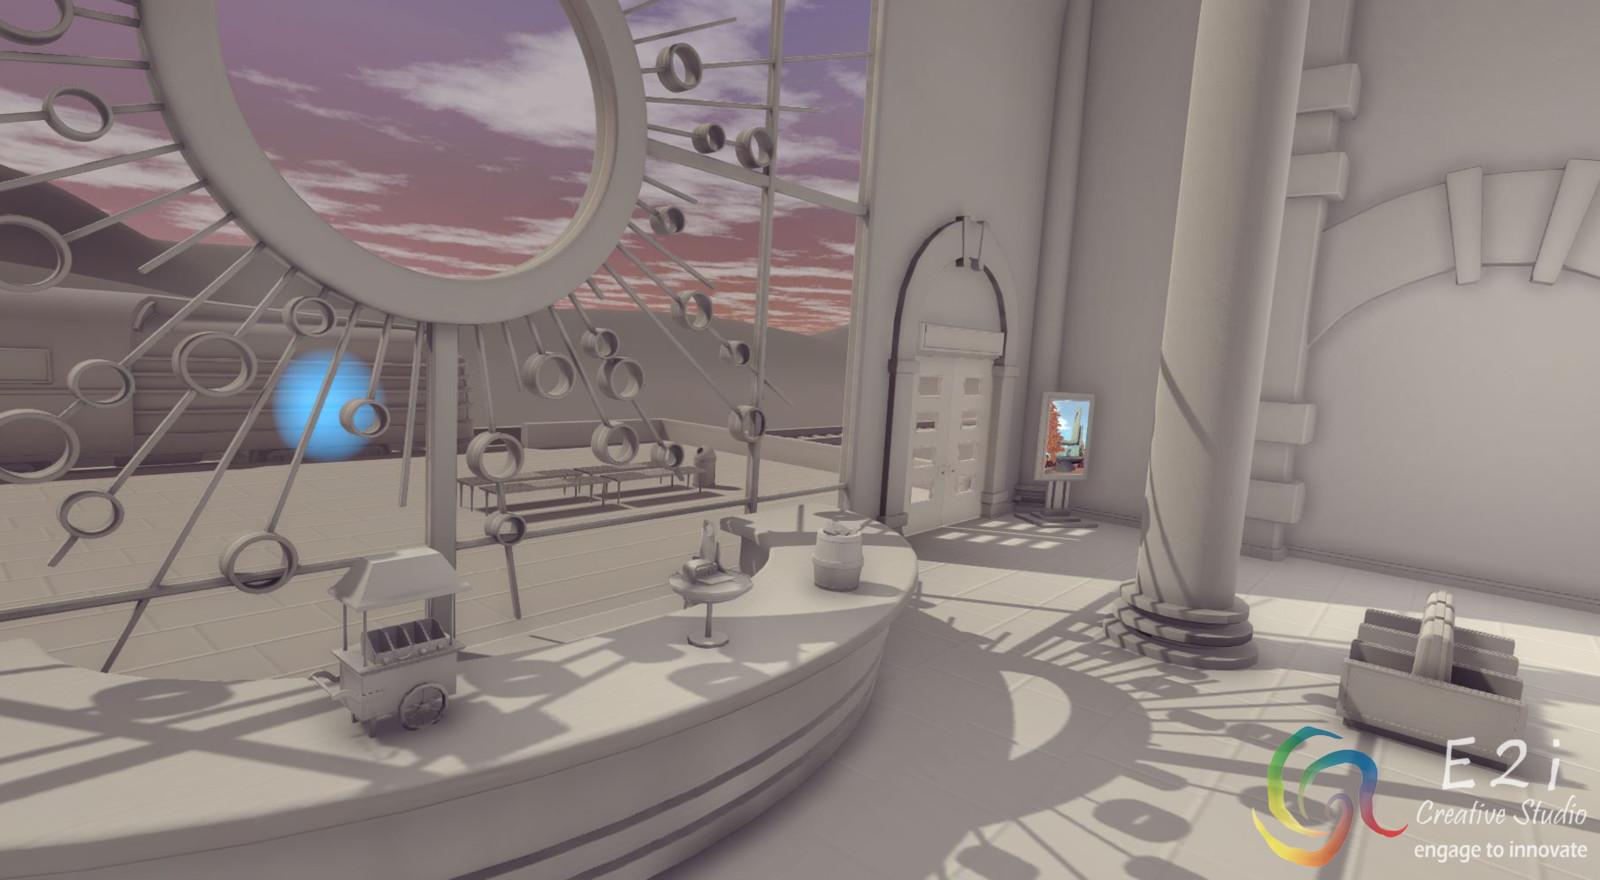 Trainstation Hub - E2I Creative Studio